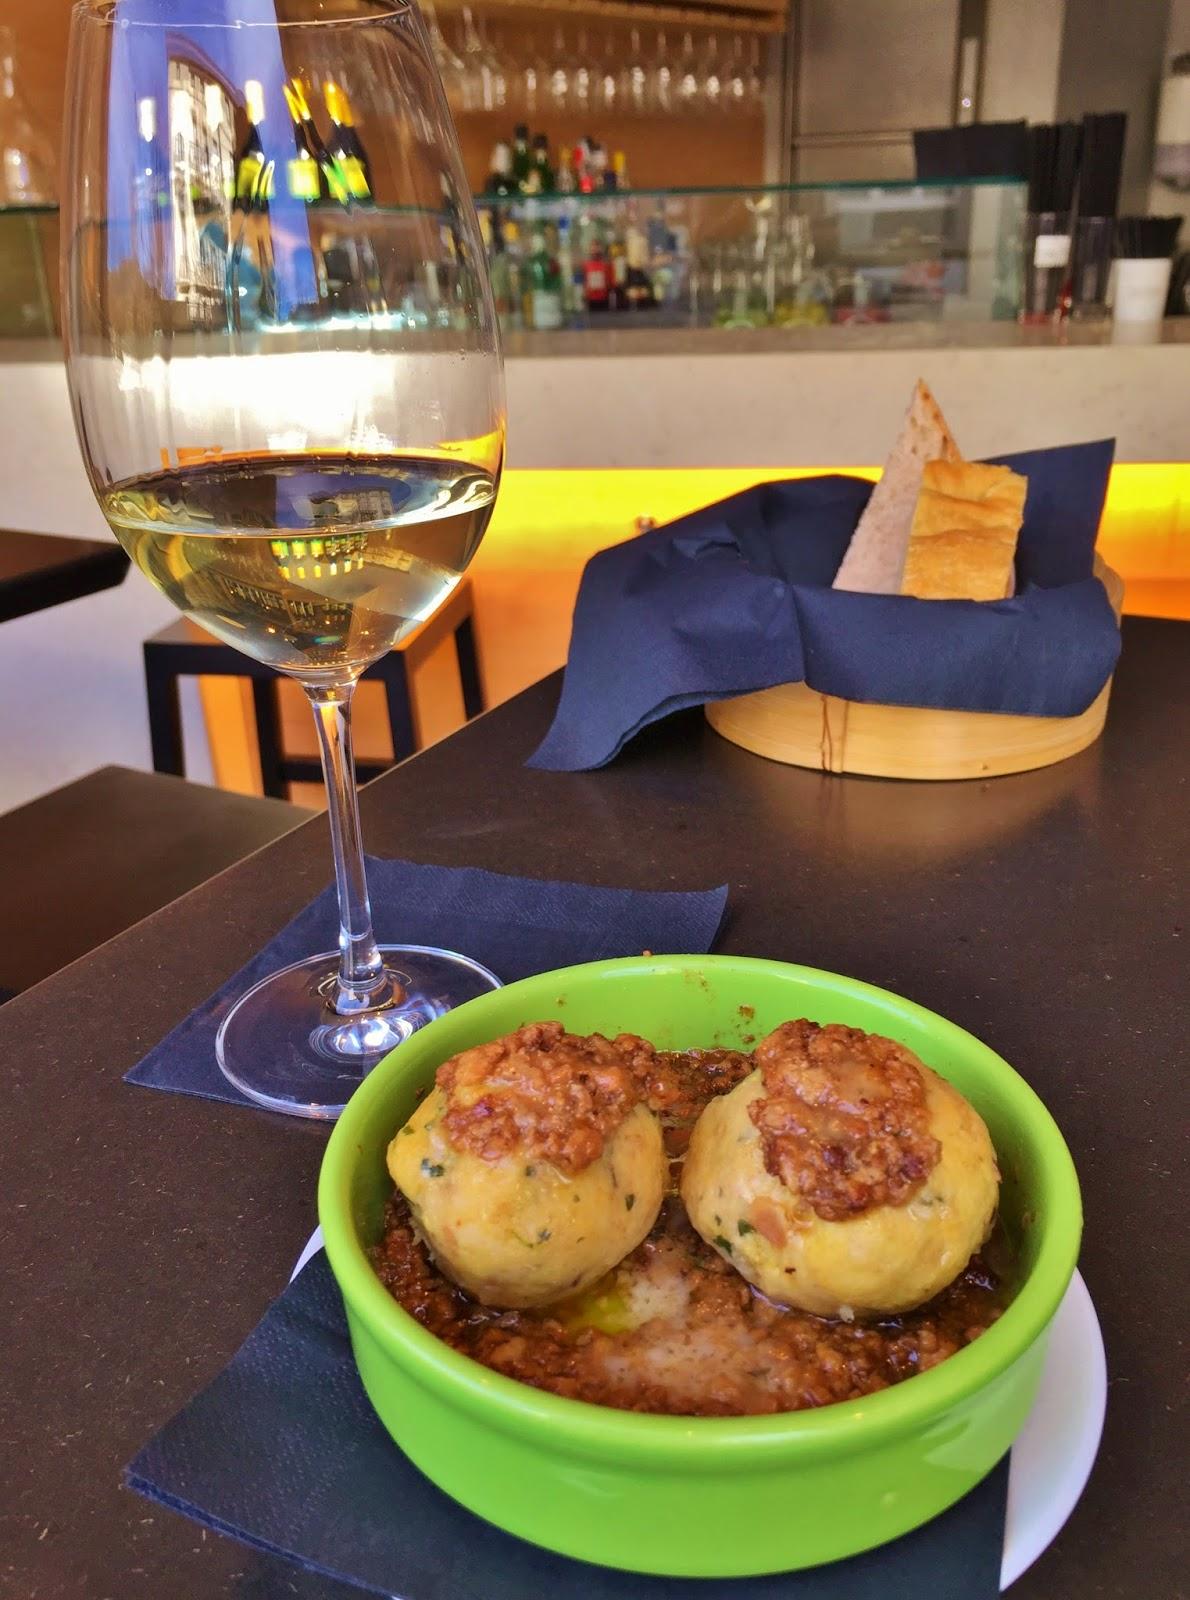 Canederli dumplings with Muller Thurgau